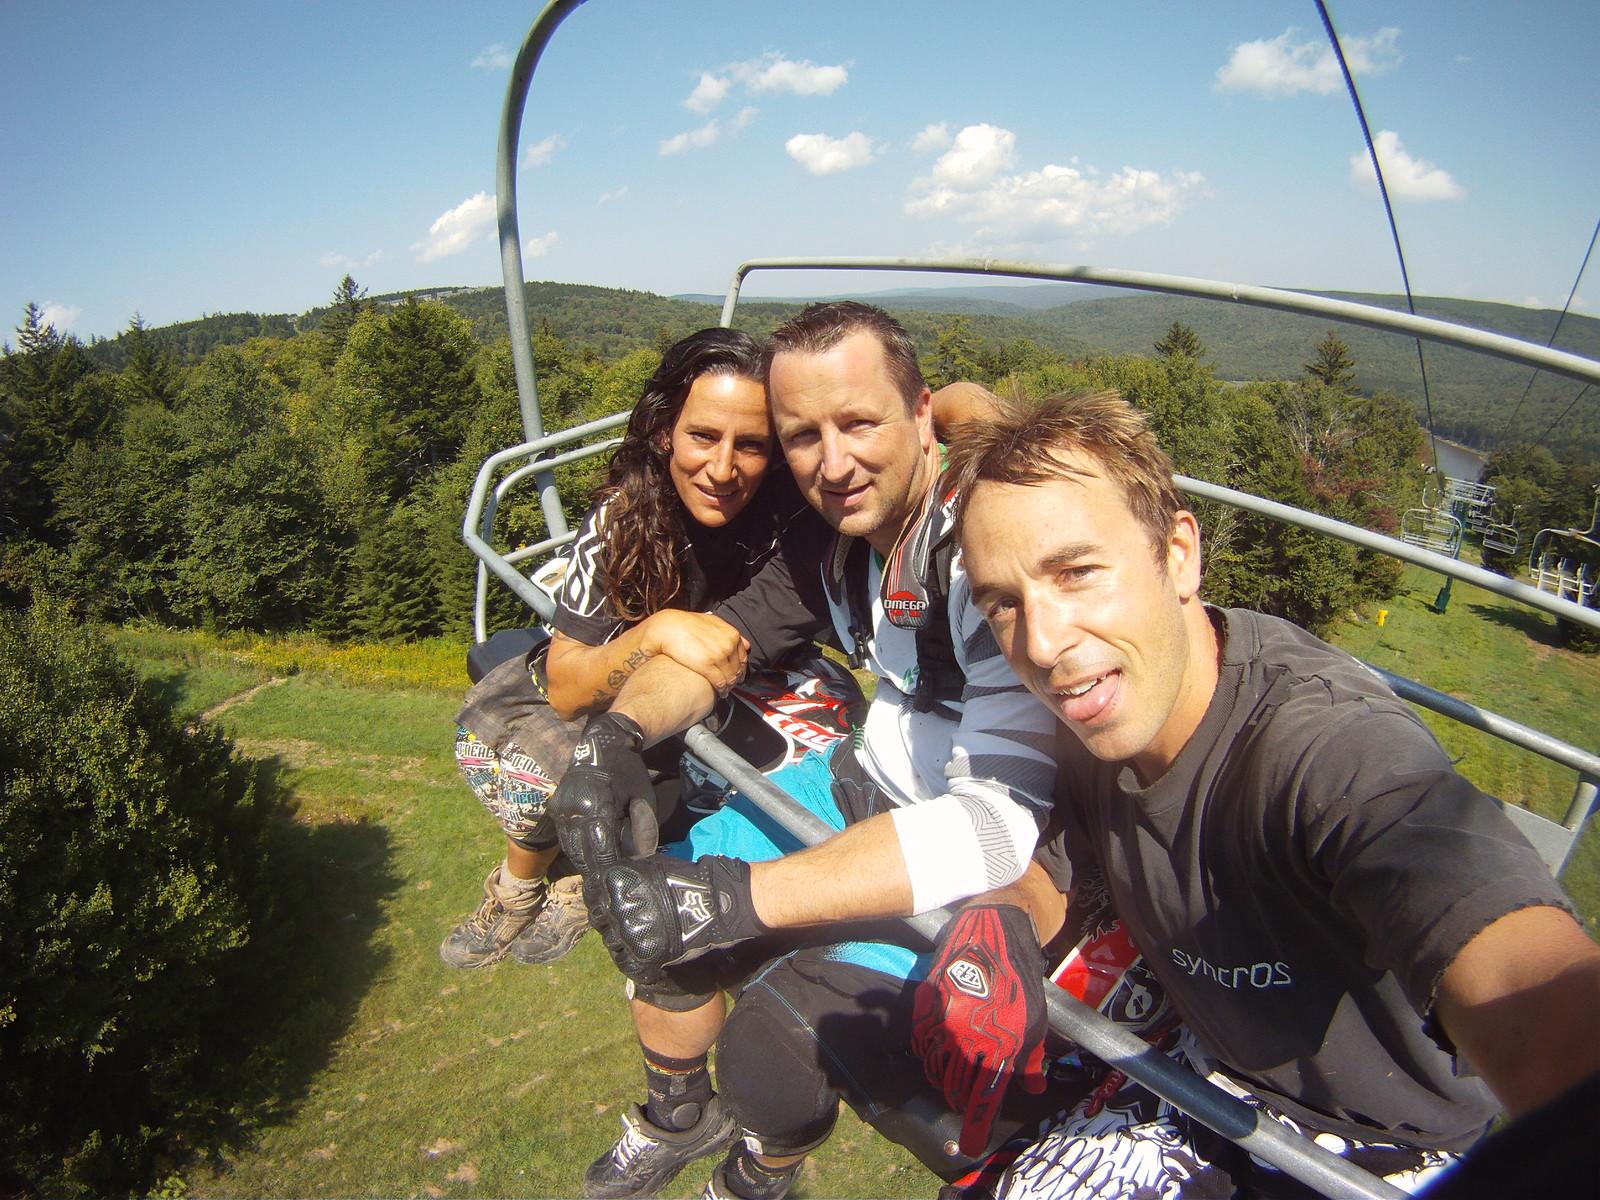 Missy G - paol951 - Mountain Biking Pictures - Vital MTB